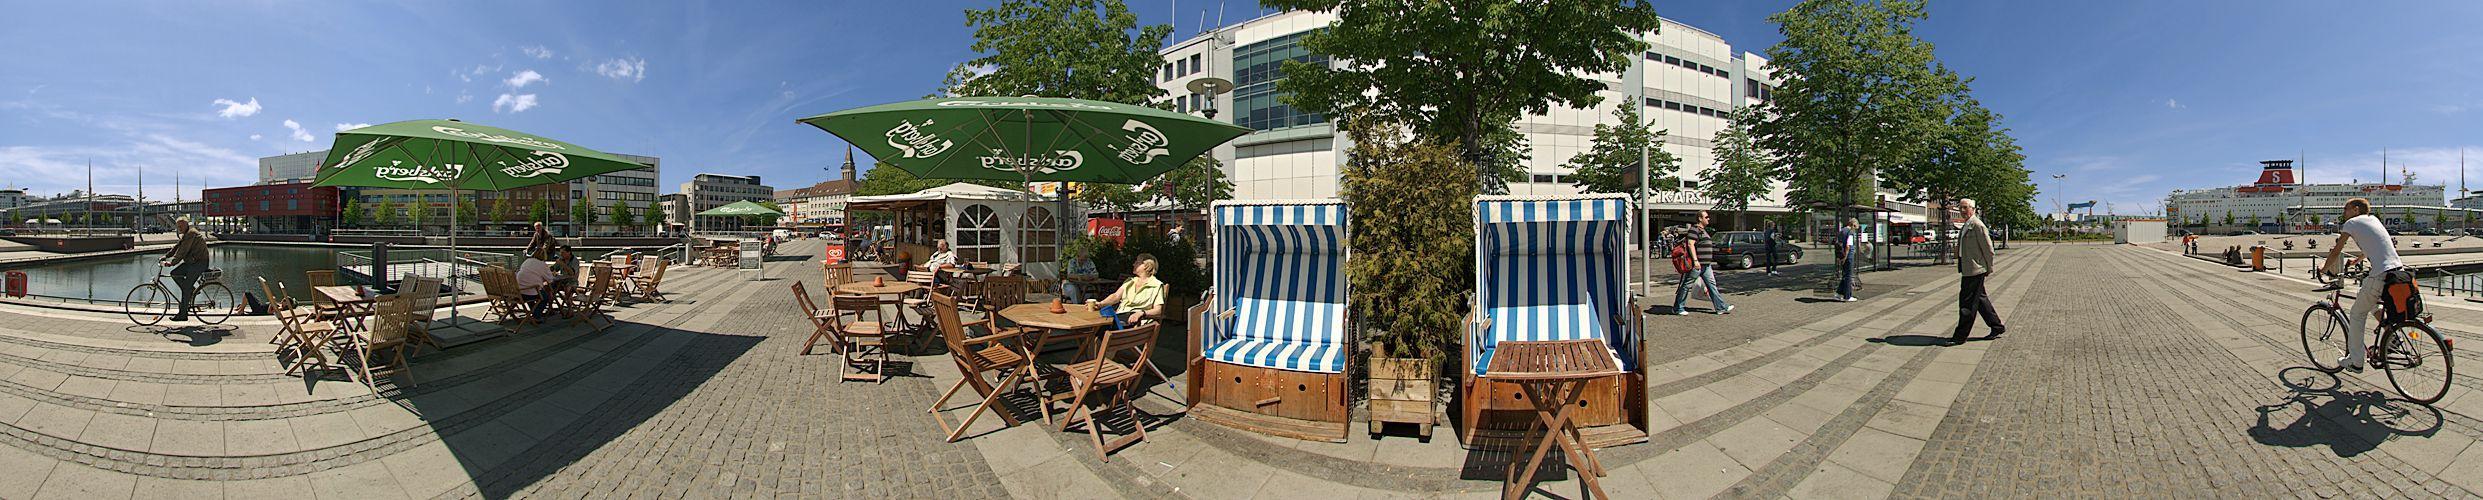 Foto Kiel Asmus Bremer Platz at The Asmus-bremer-platz 280m